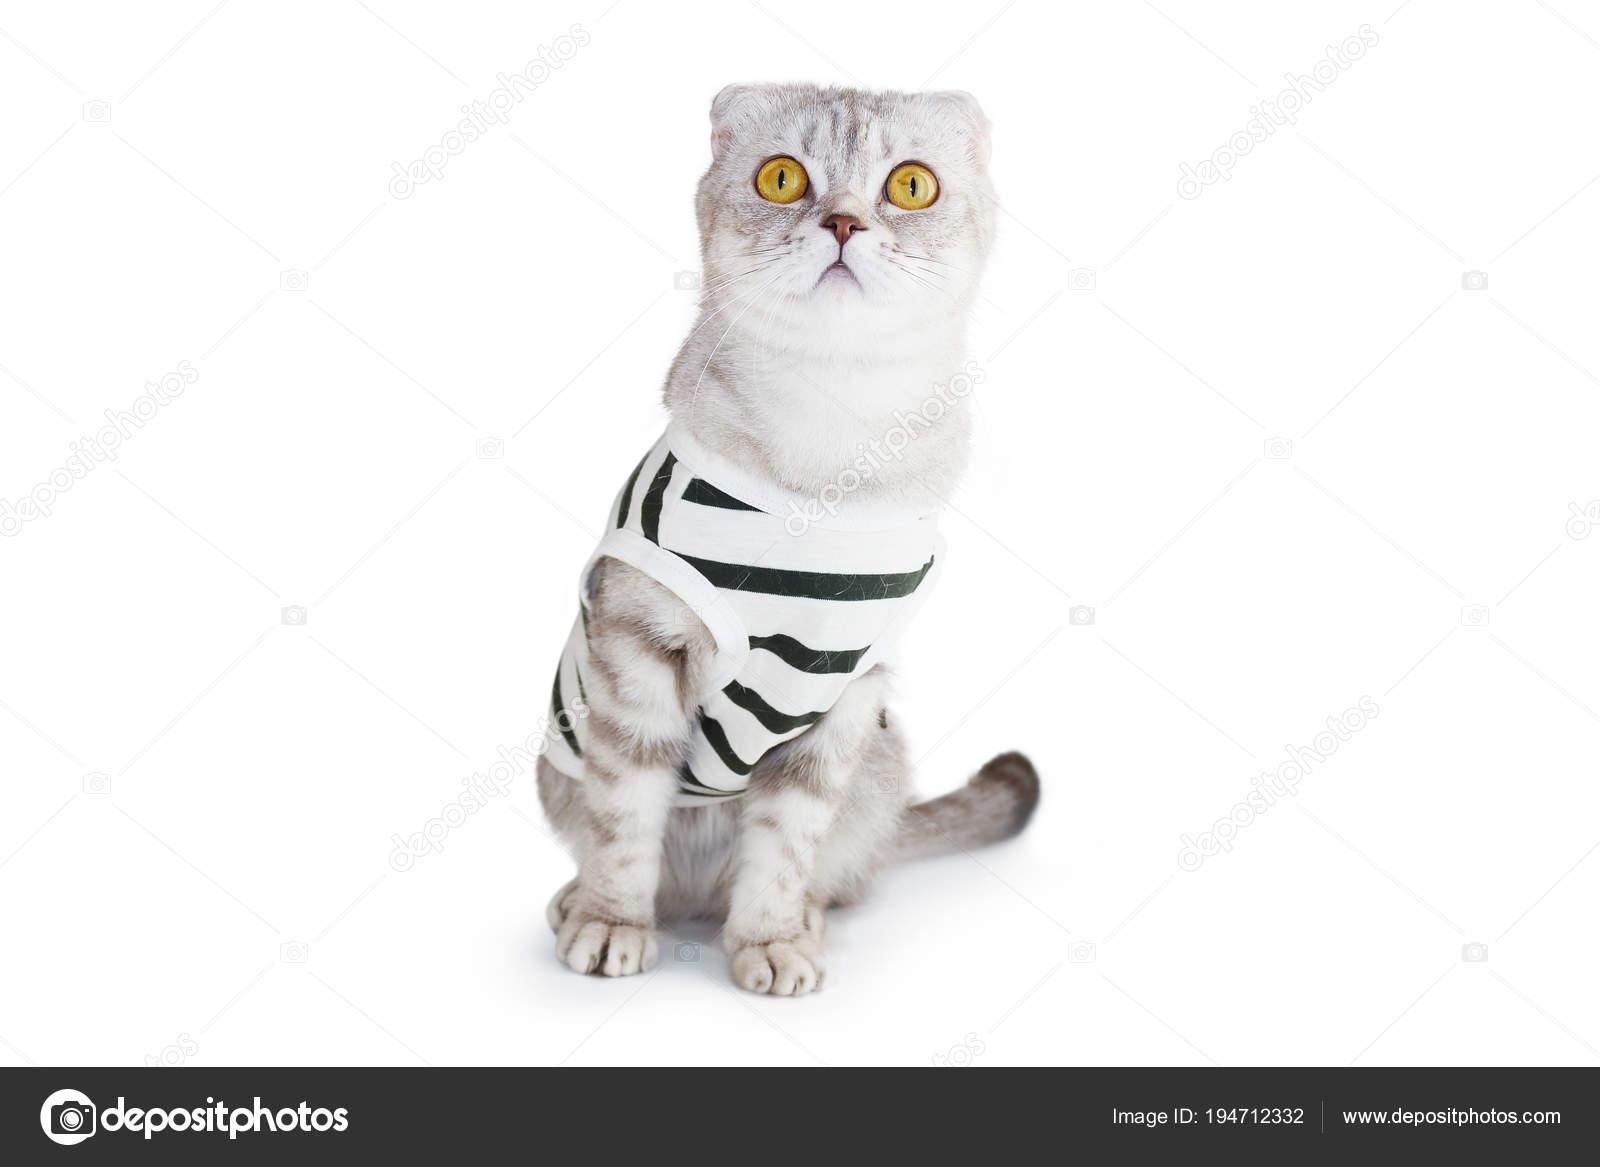 b68ff41fc412 γάτα σε ρούχα σε λευκό φόντο — Φωτογραφία Αρχείου © Doriti  194712332